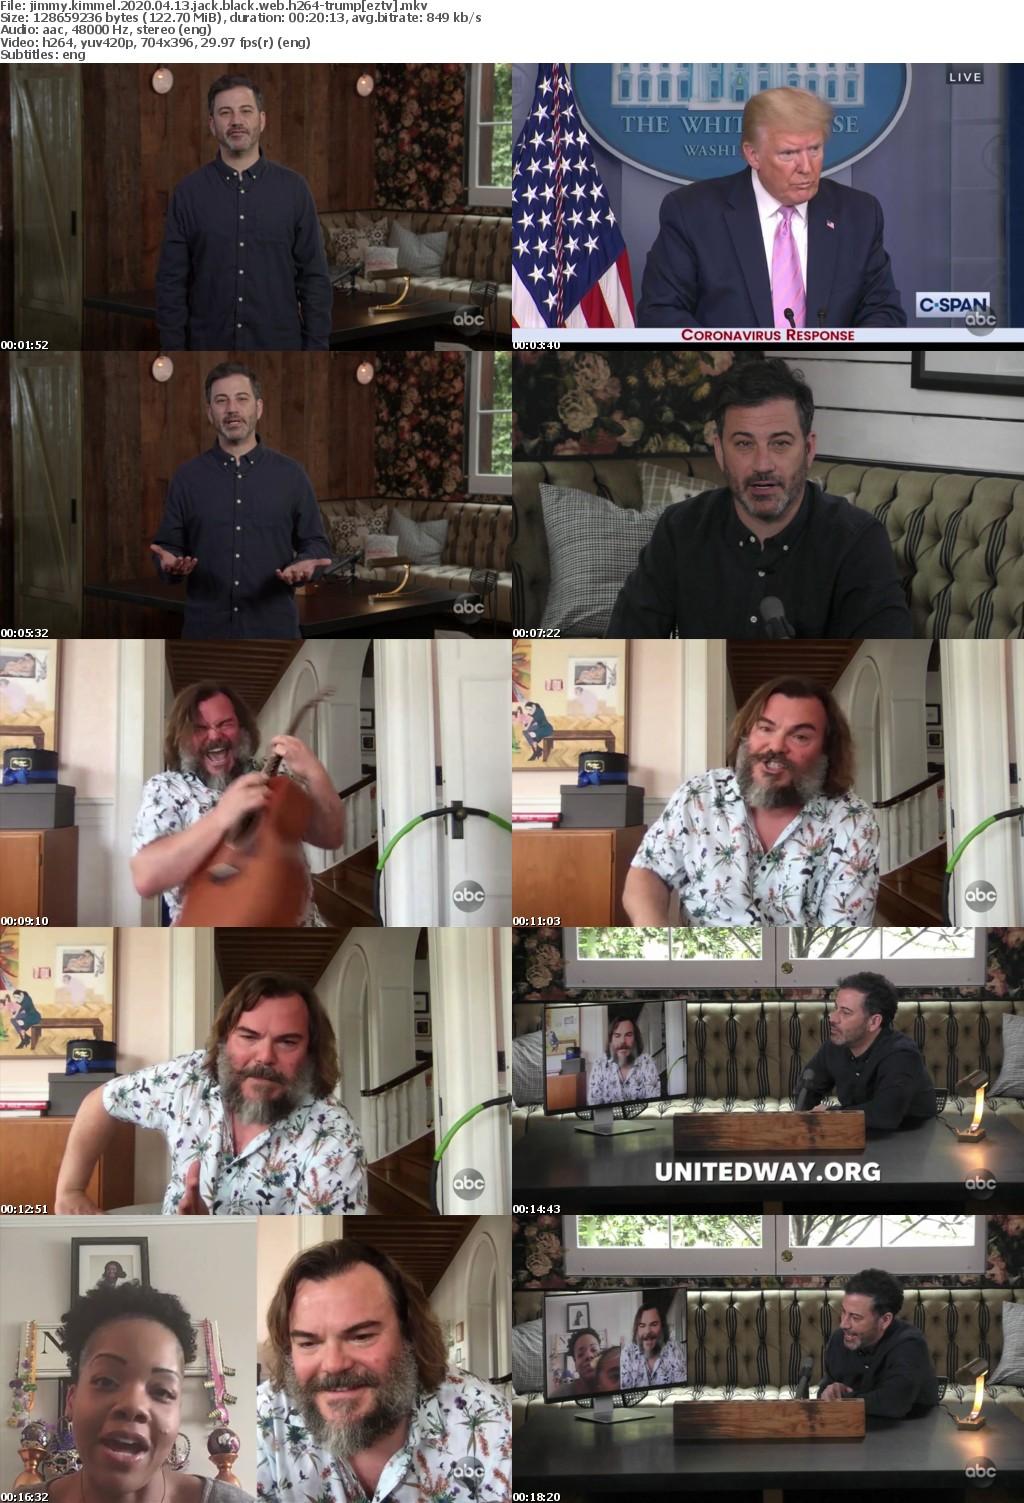 Jimmy Kimmel 2020 04 13 Jack Black WEB h264-TRUMP